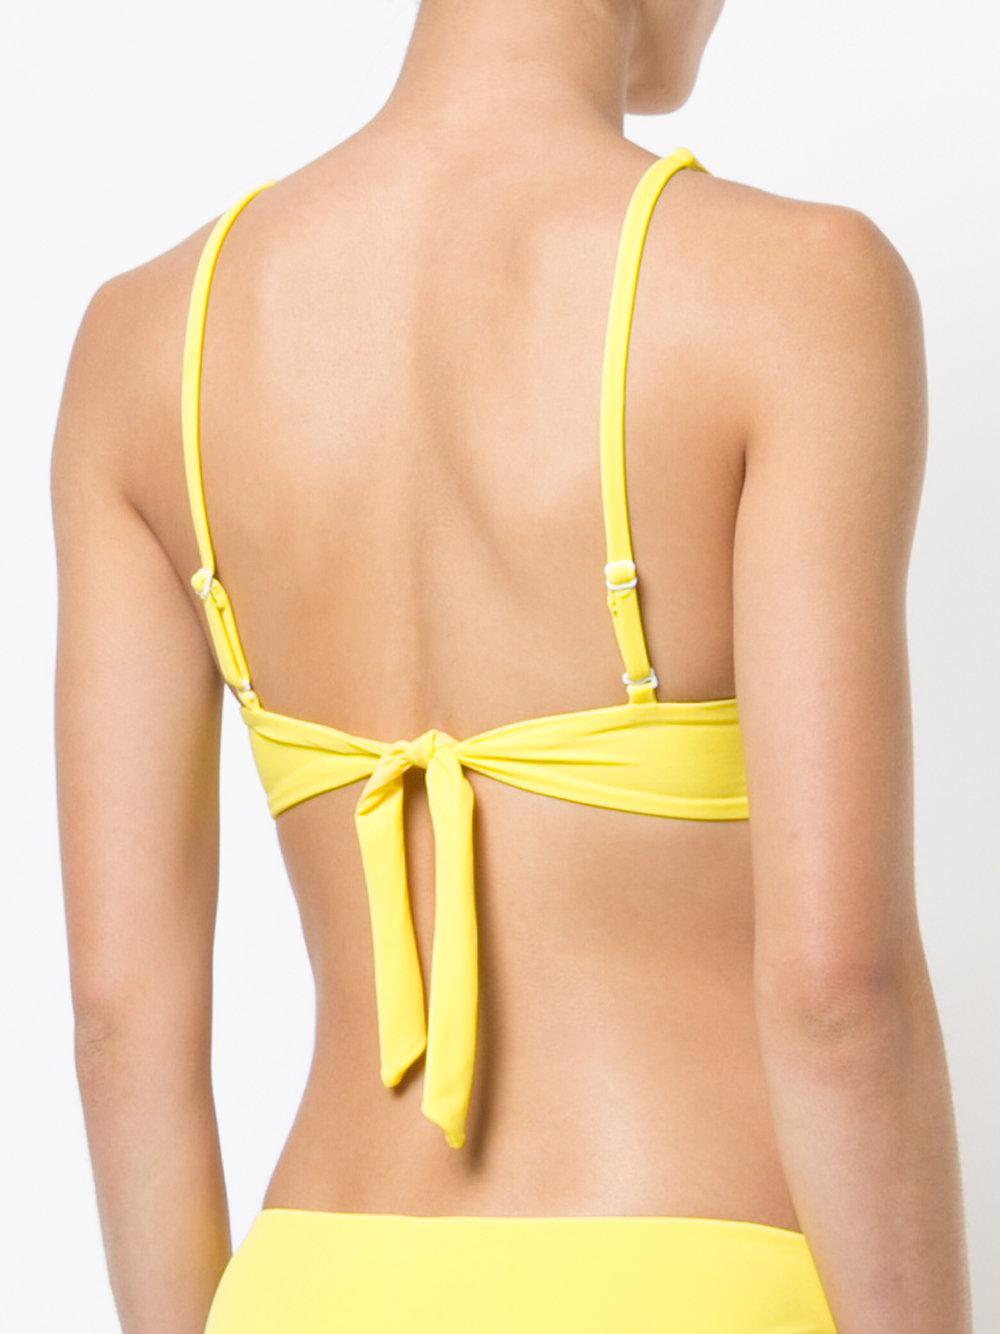 Keira bikini top - Yellow & Orange Onia Genuine mmRN6EzKbK